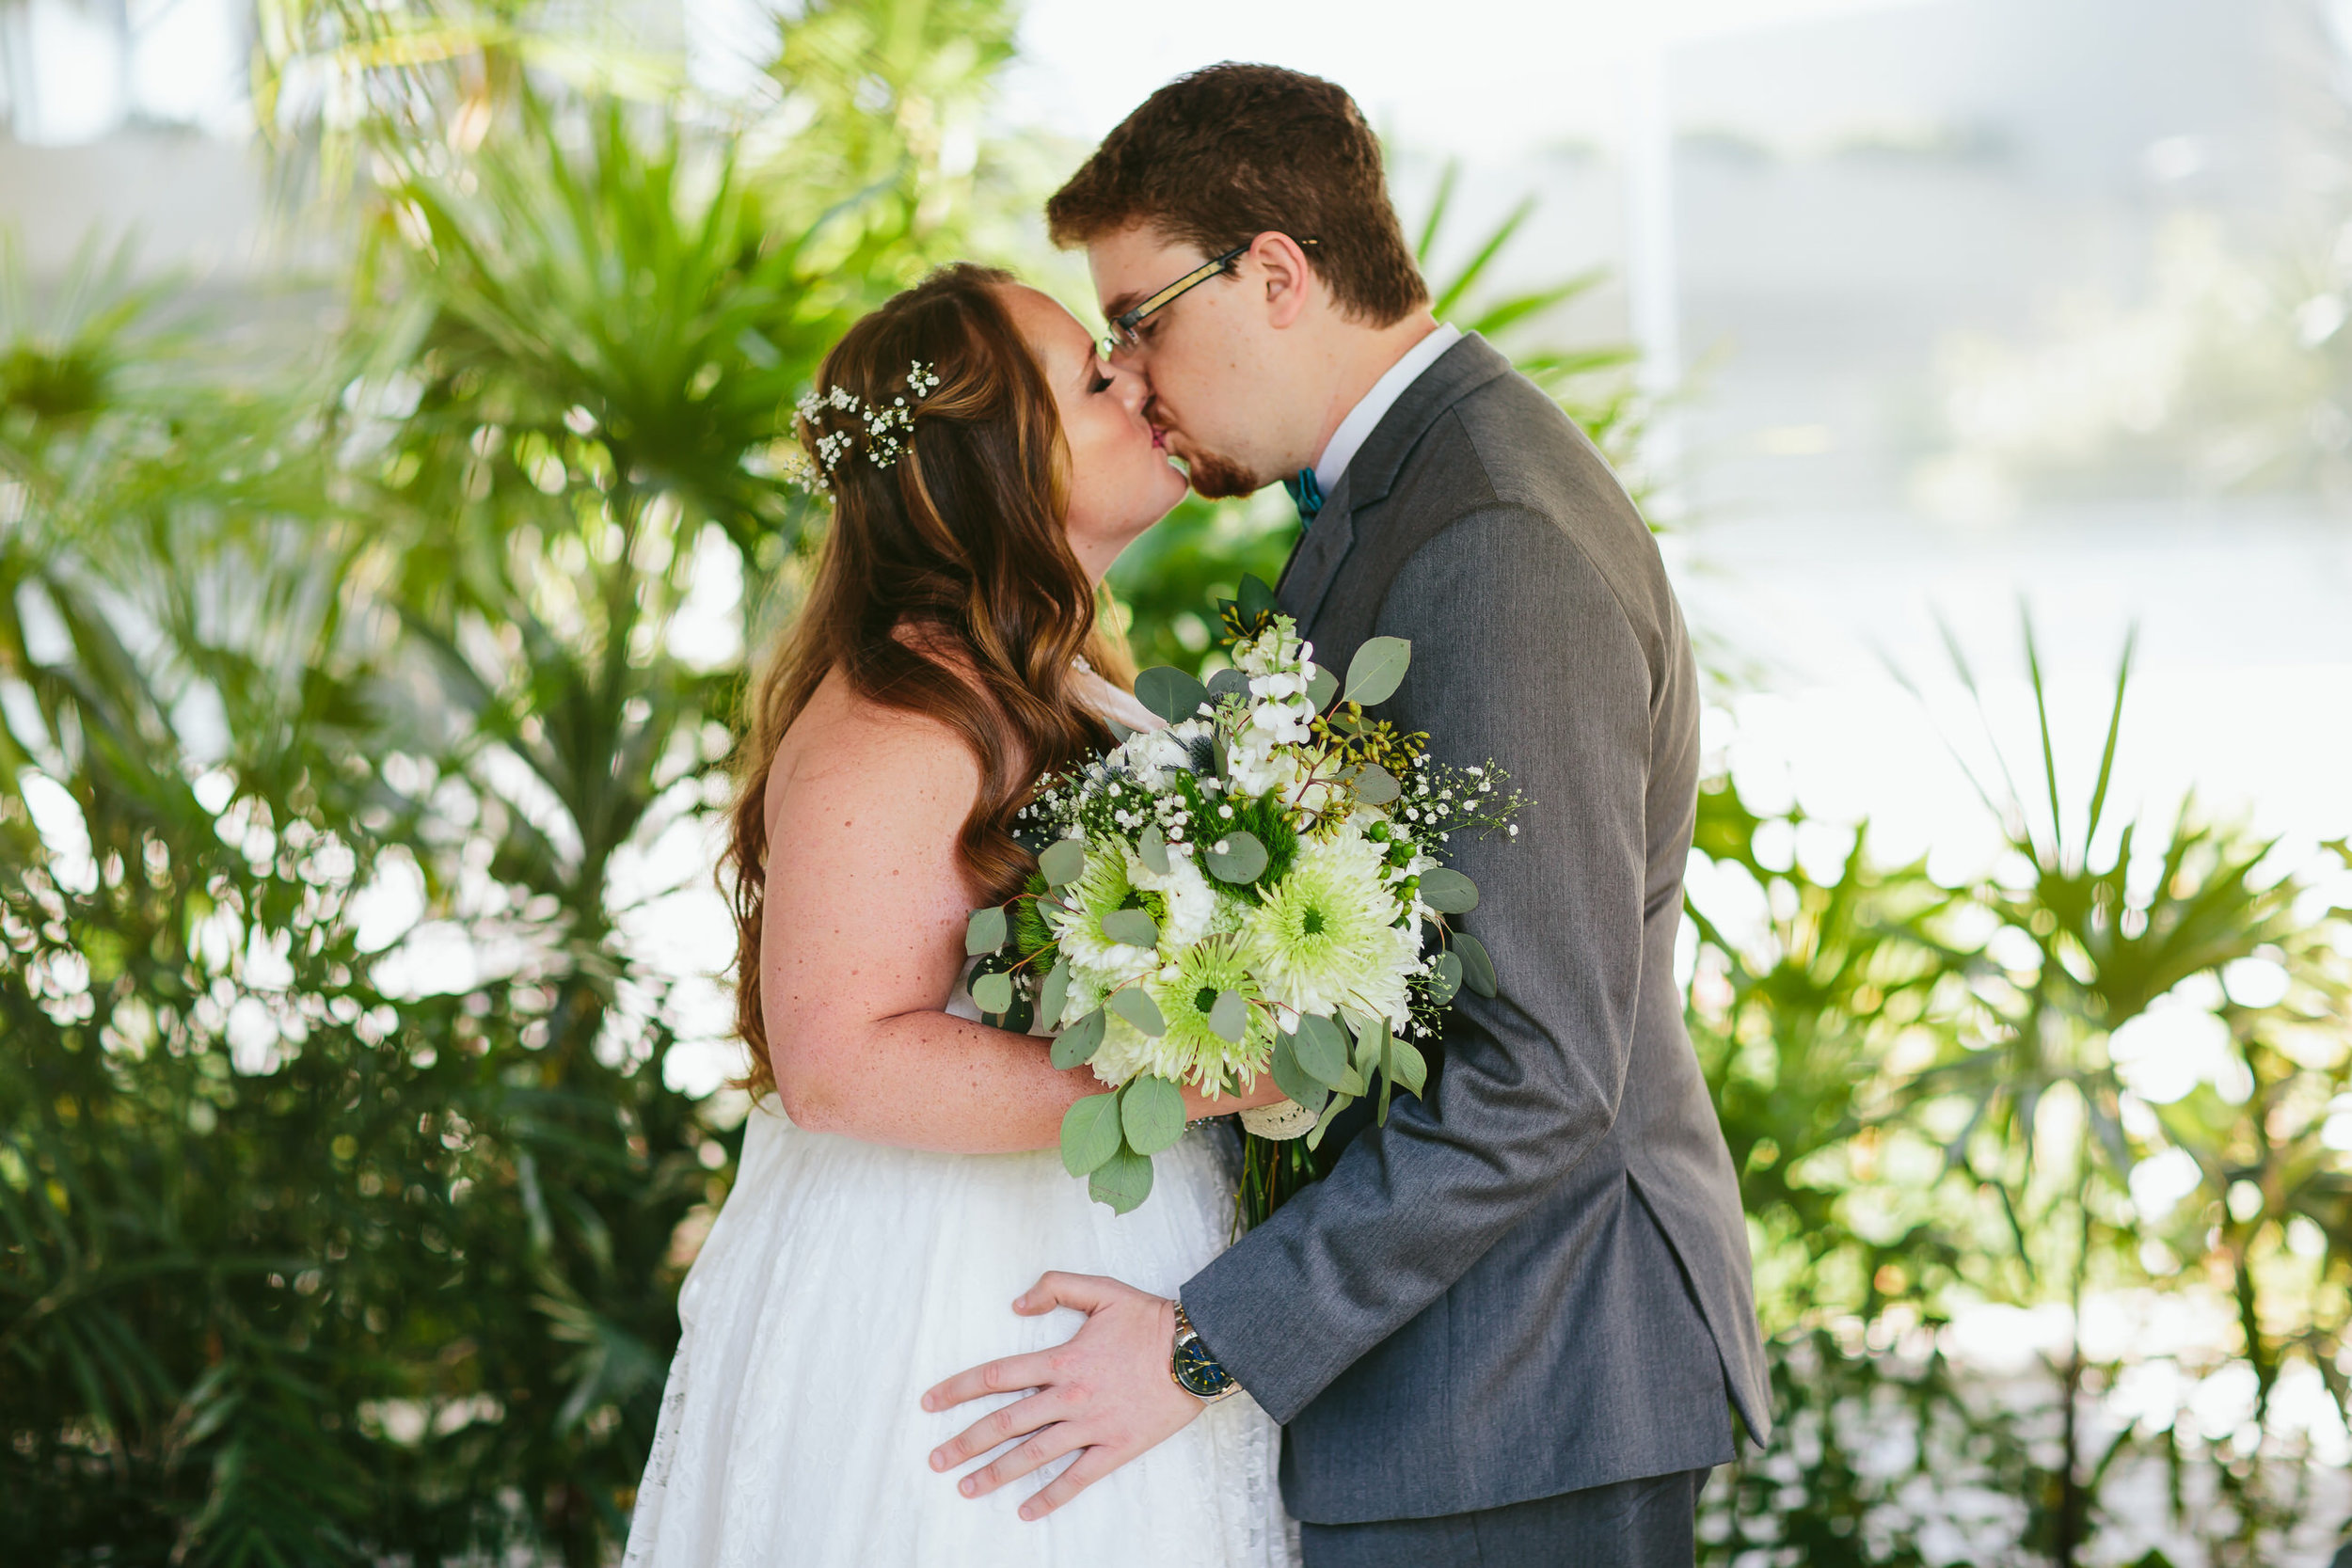 lighthouse_point_yacht_club_wedding_first_look_bride_groom.jpg